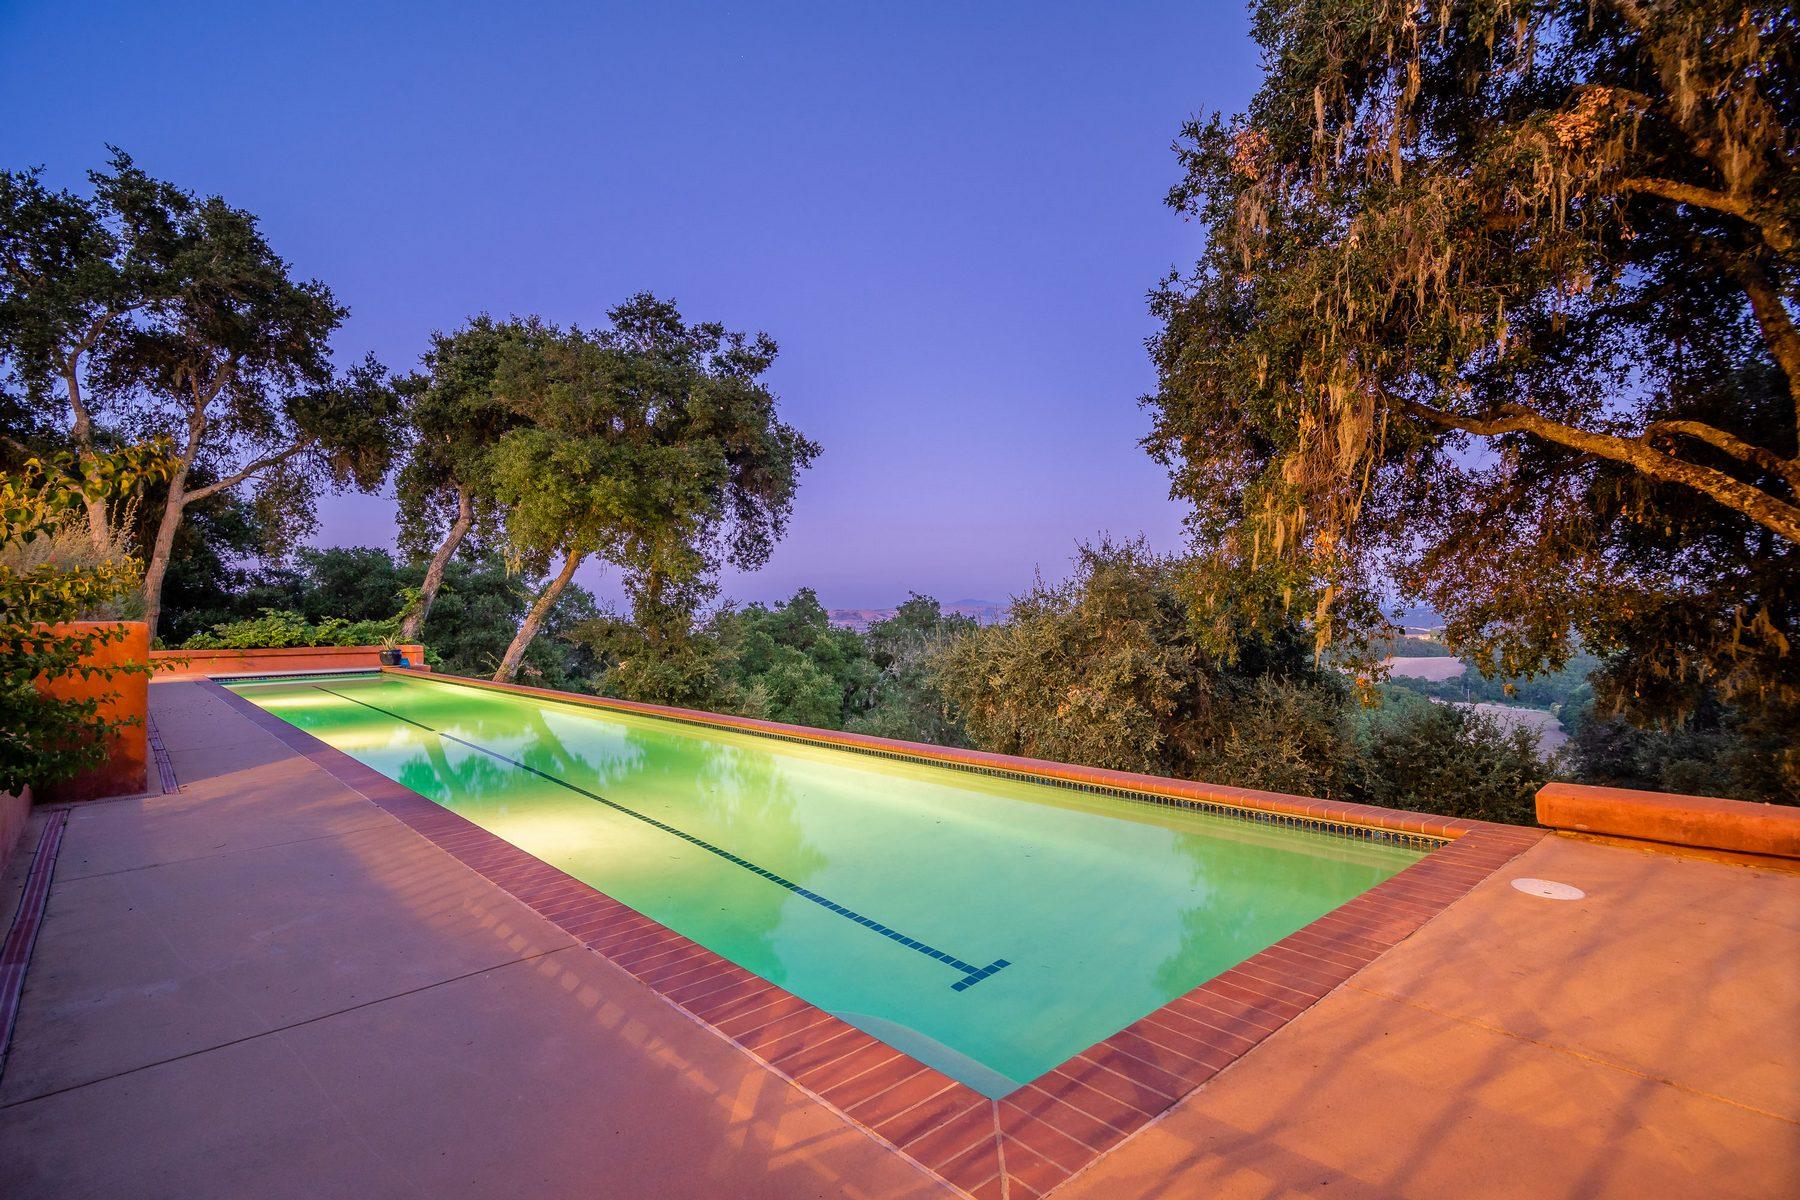 Single Family Homes for Active at Spanish-style Villa & Vineyard on 30+/- Acres 3432 Las Tablas Wiliow Creek Paso Robles, California 93446 United States